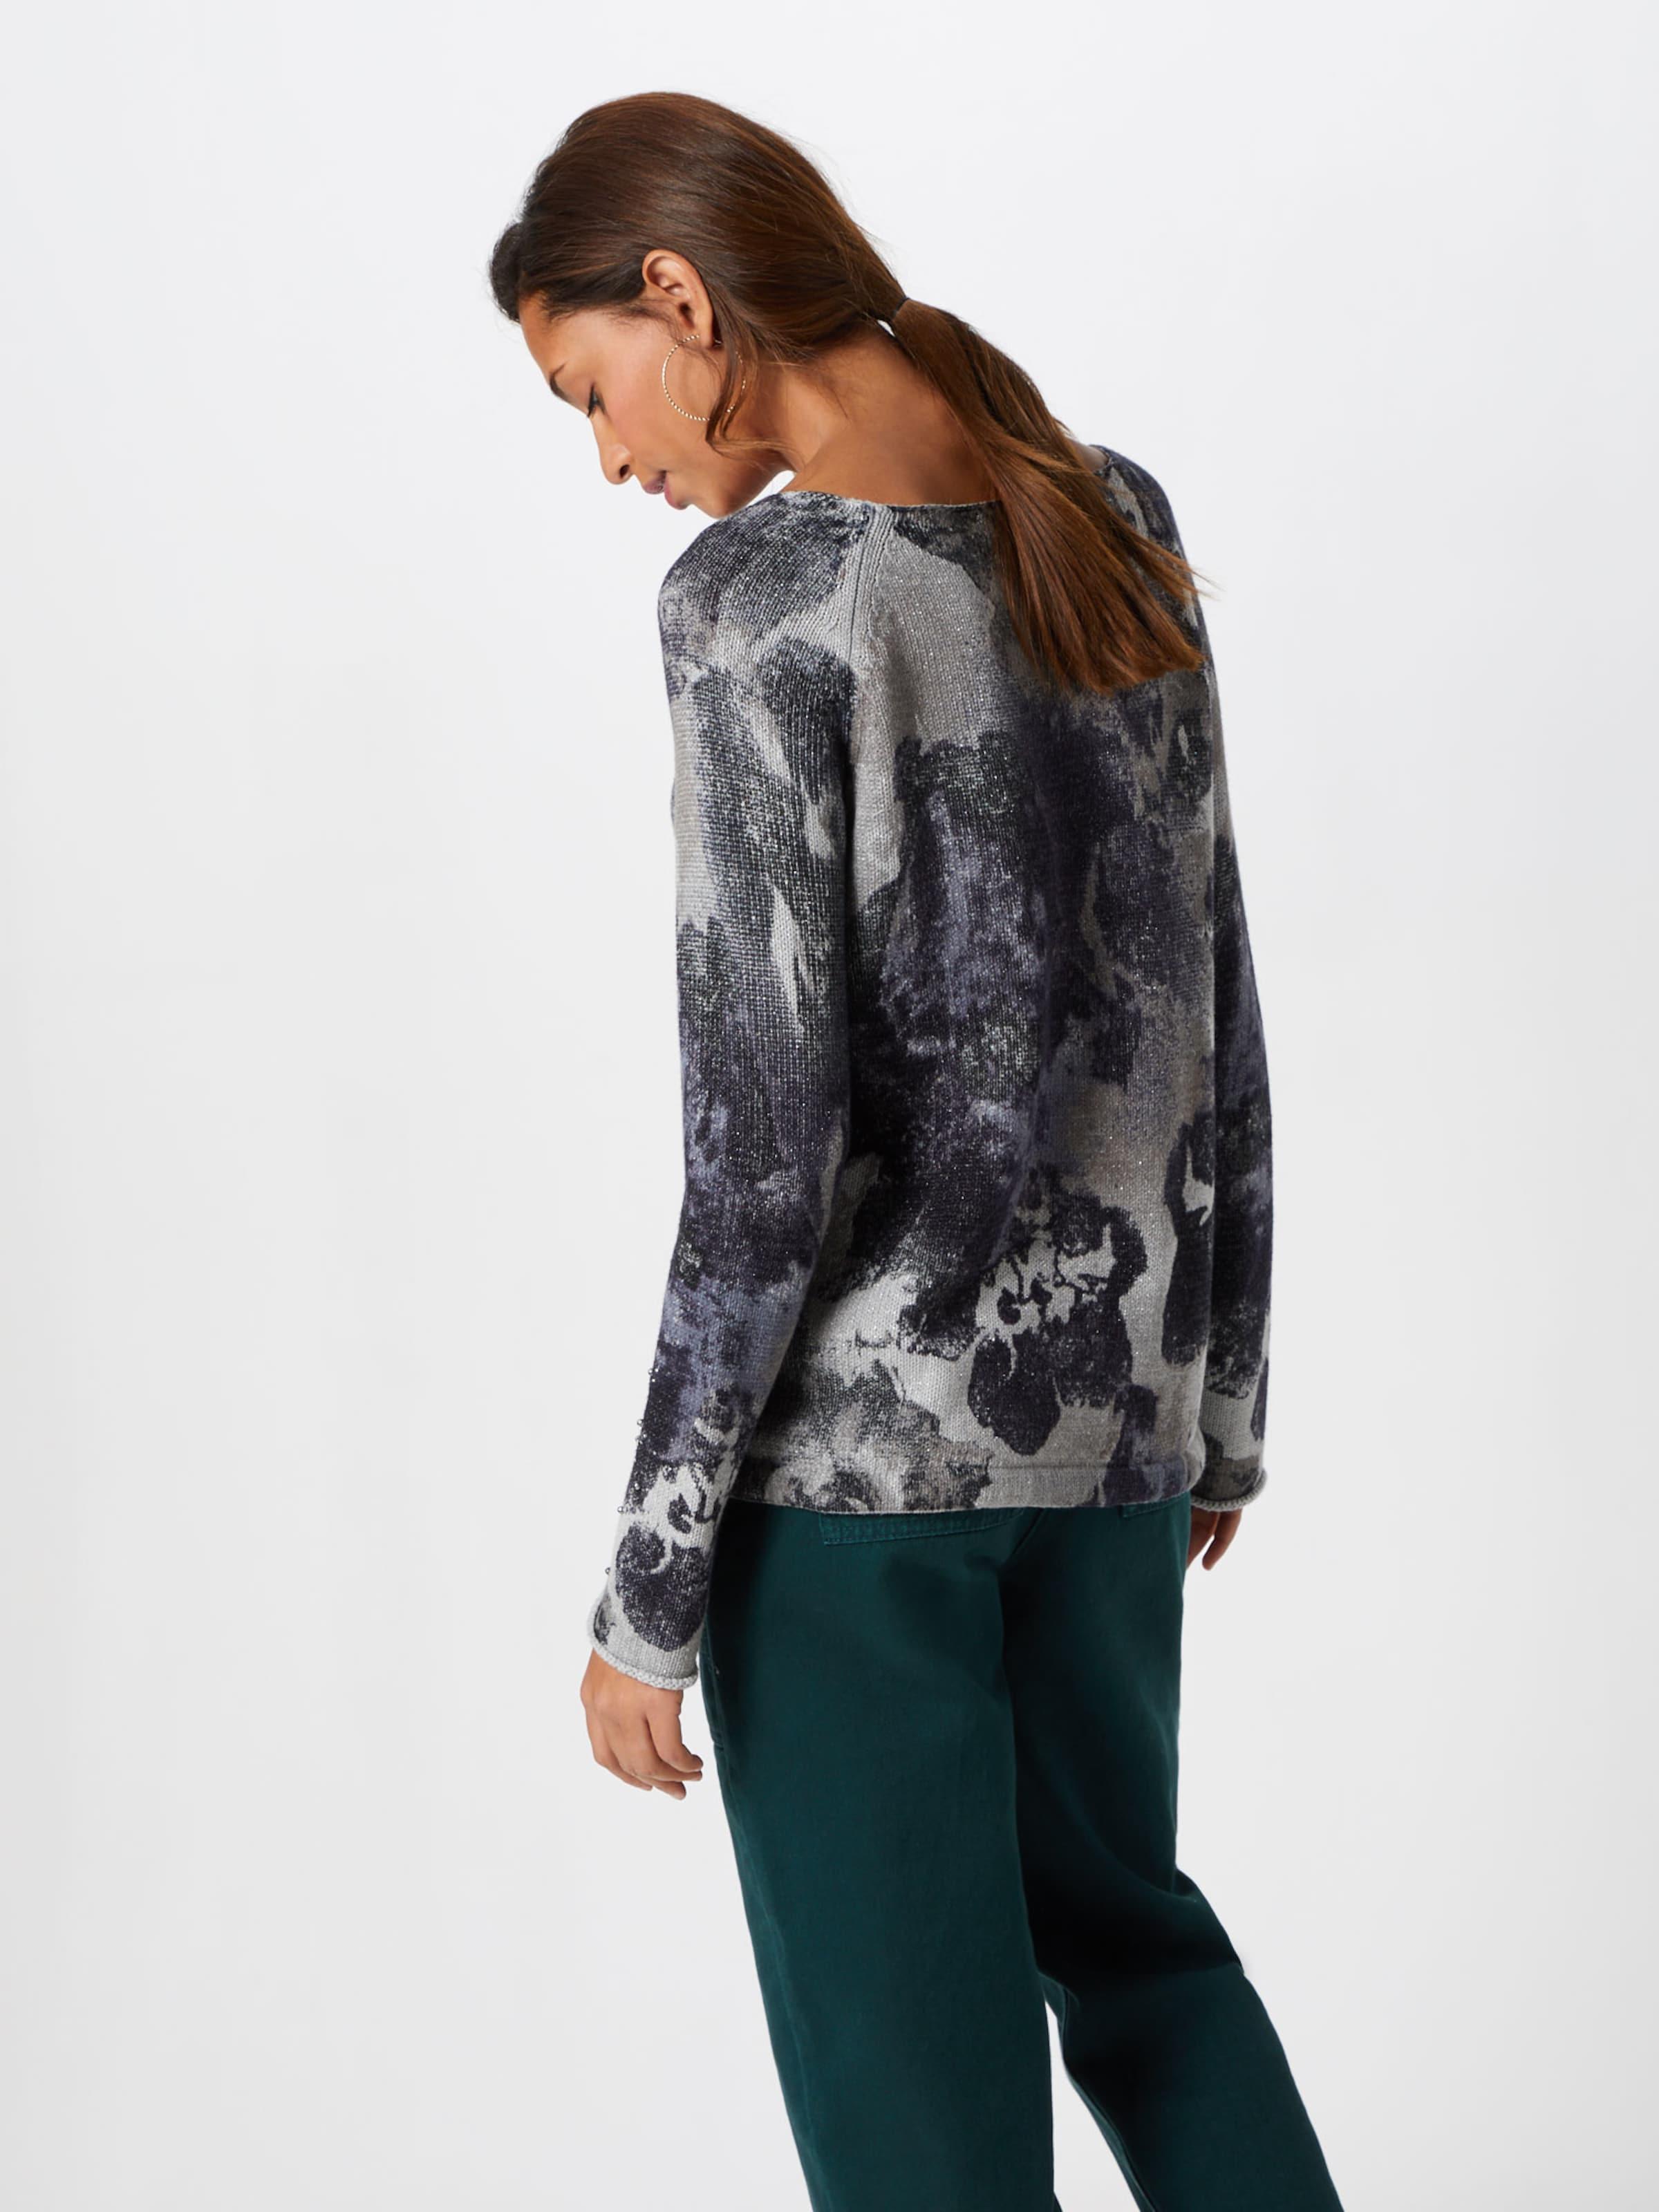 Monari Pullover Pullover In Grau Monari bmgyY7vIf6